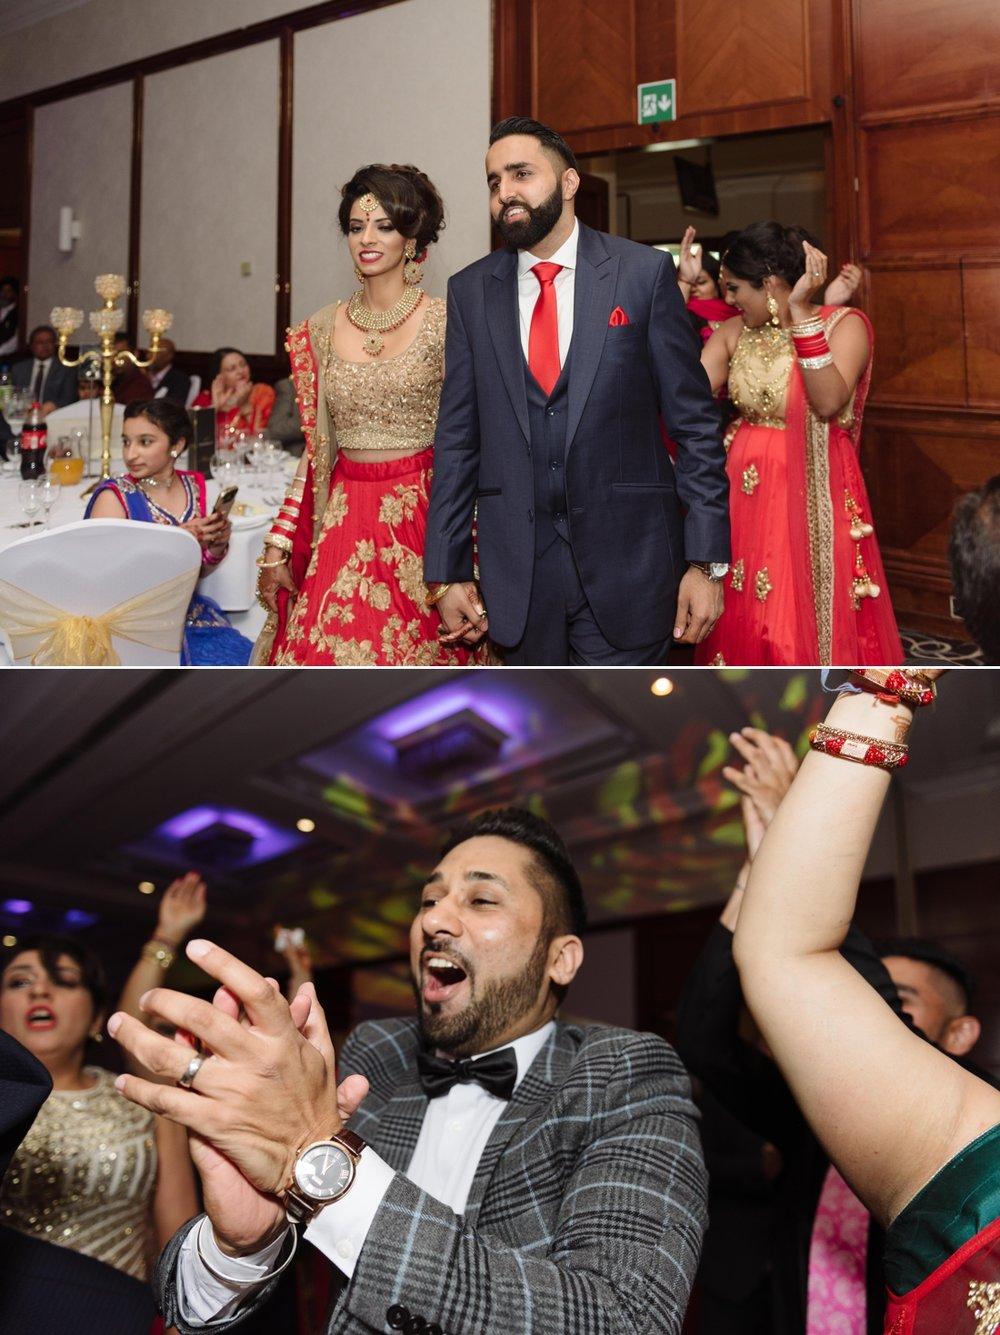 Gurpreet and Nick Sikh Wedding 2 - Southampton - Photos by Abhi 64.jpg